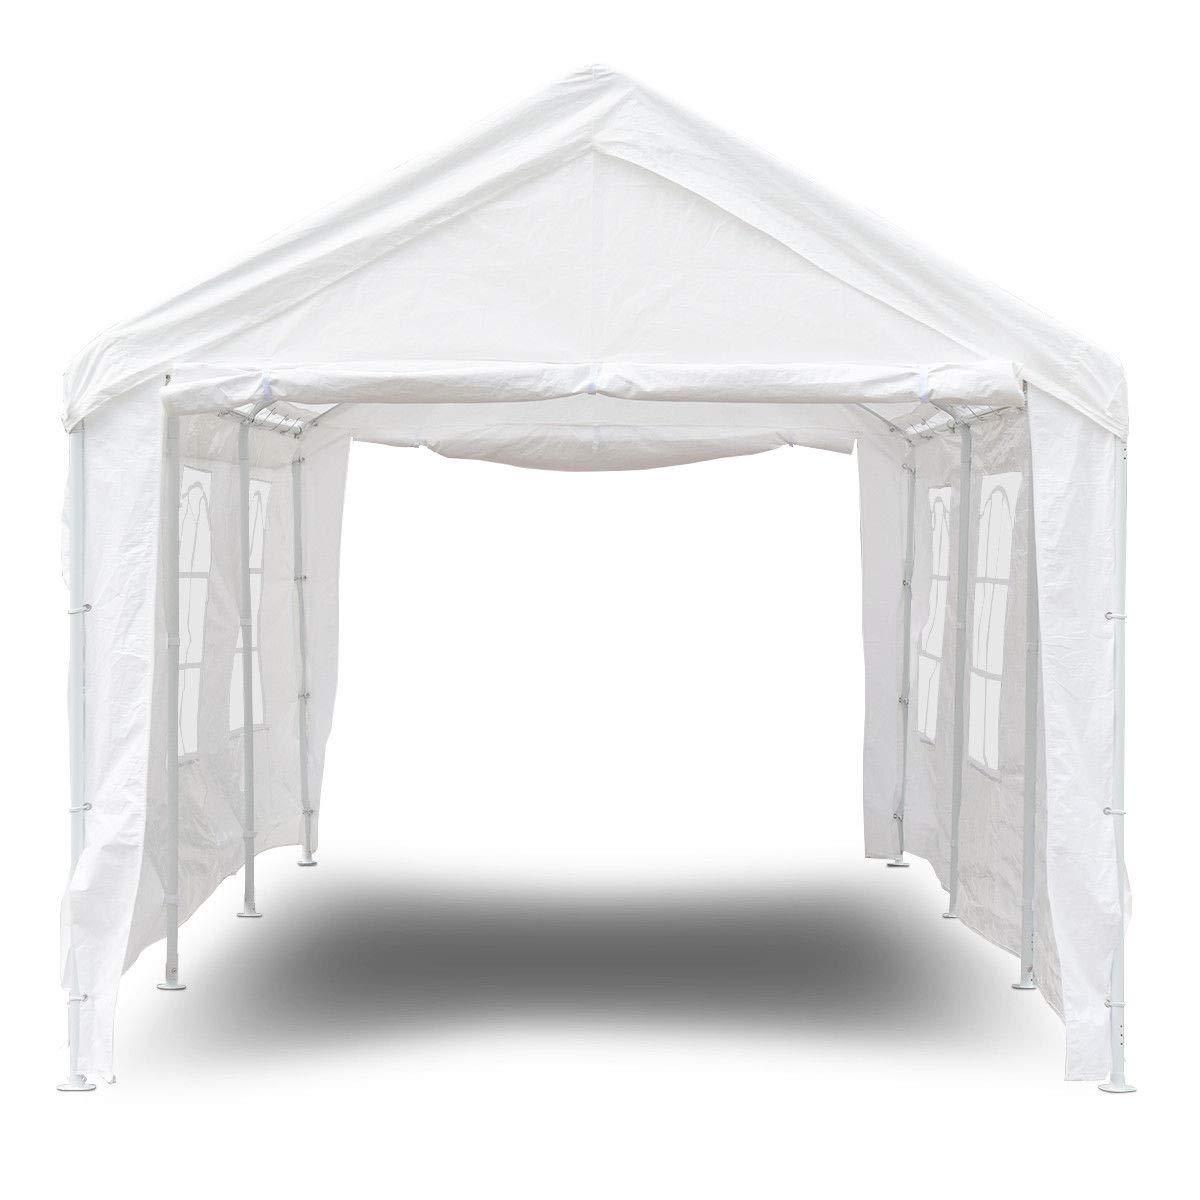 10' x 20' Heavy Duty Party Wedding Car Canopy Tent by AchieveUSA